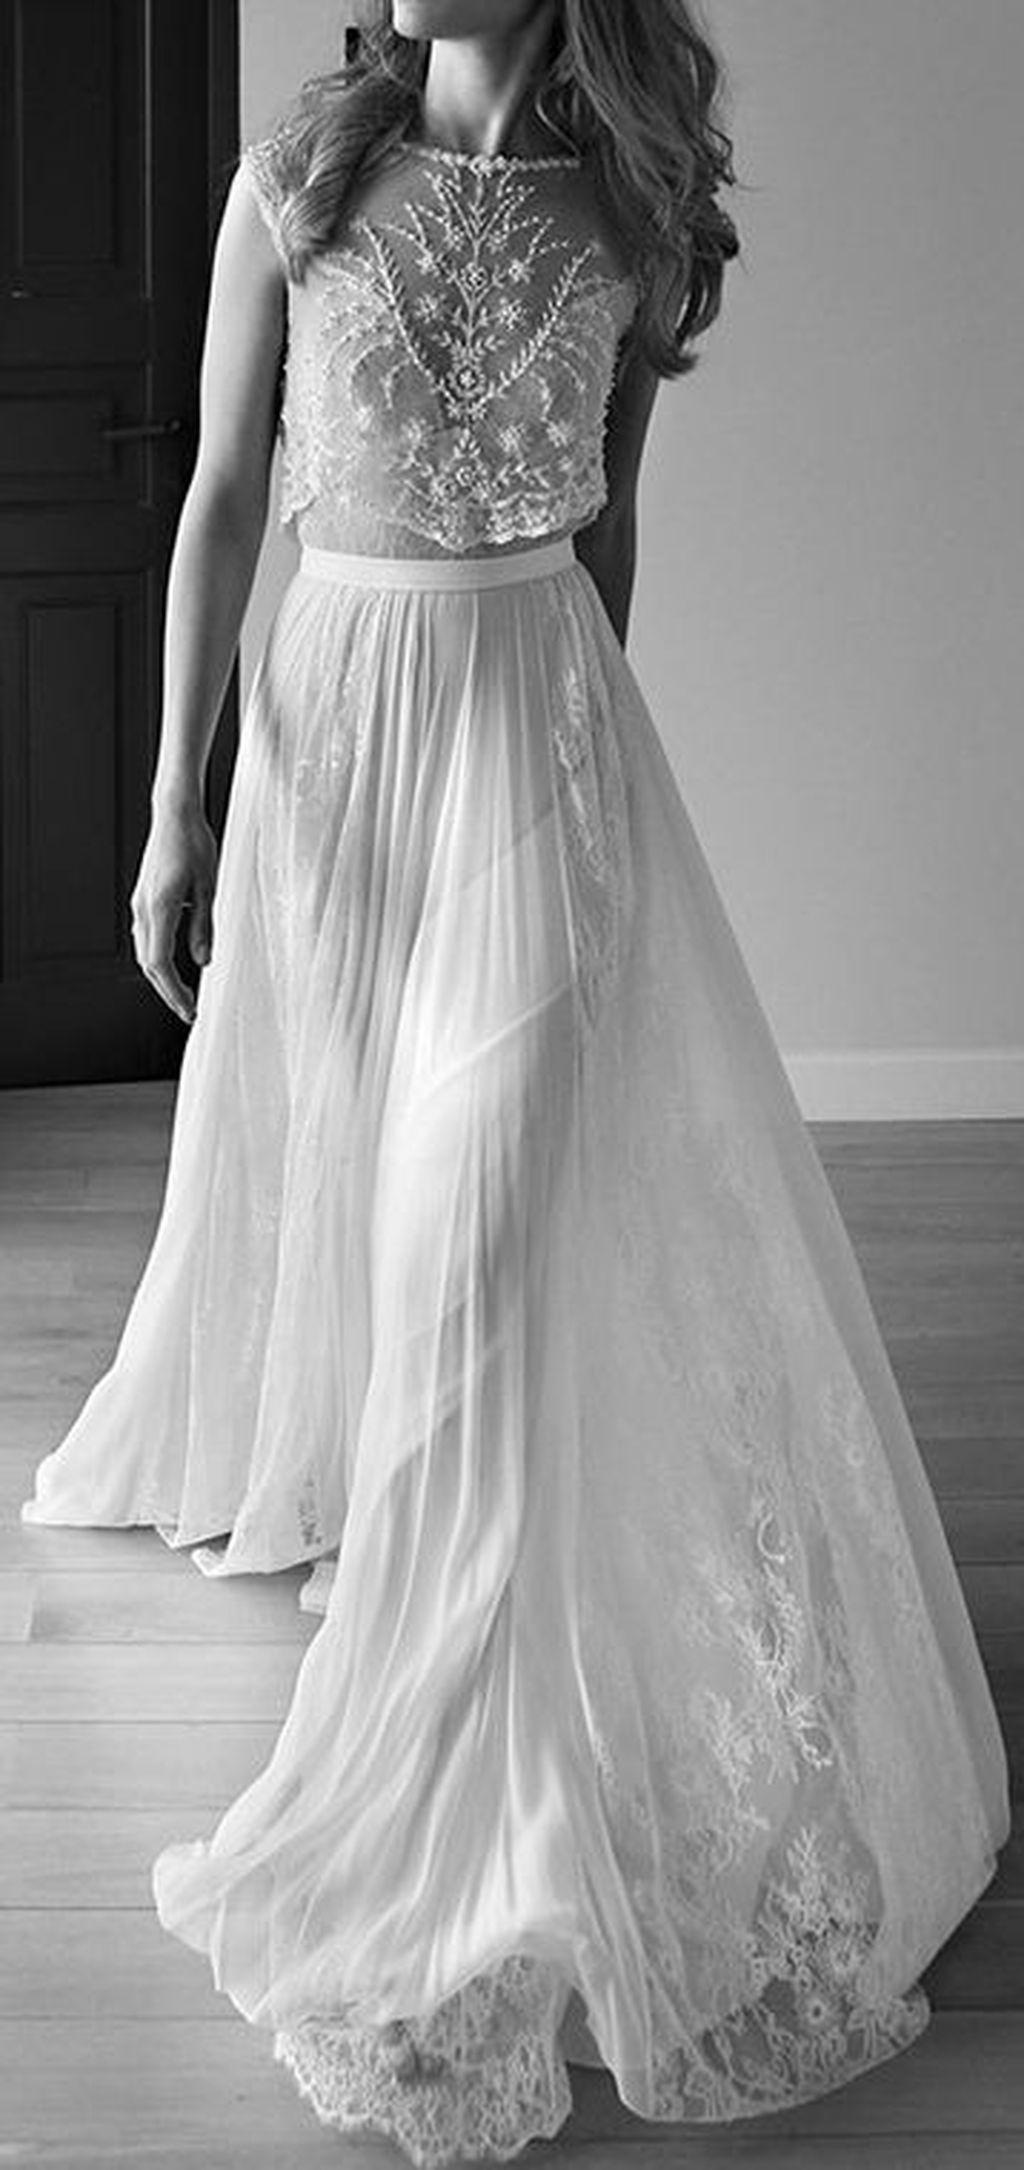 Boho wedding dress with sleeves  Adorable Bohemian Wedding Dress Ideas To Makes You Look Stunning